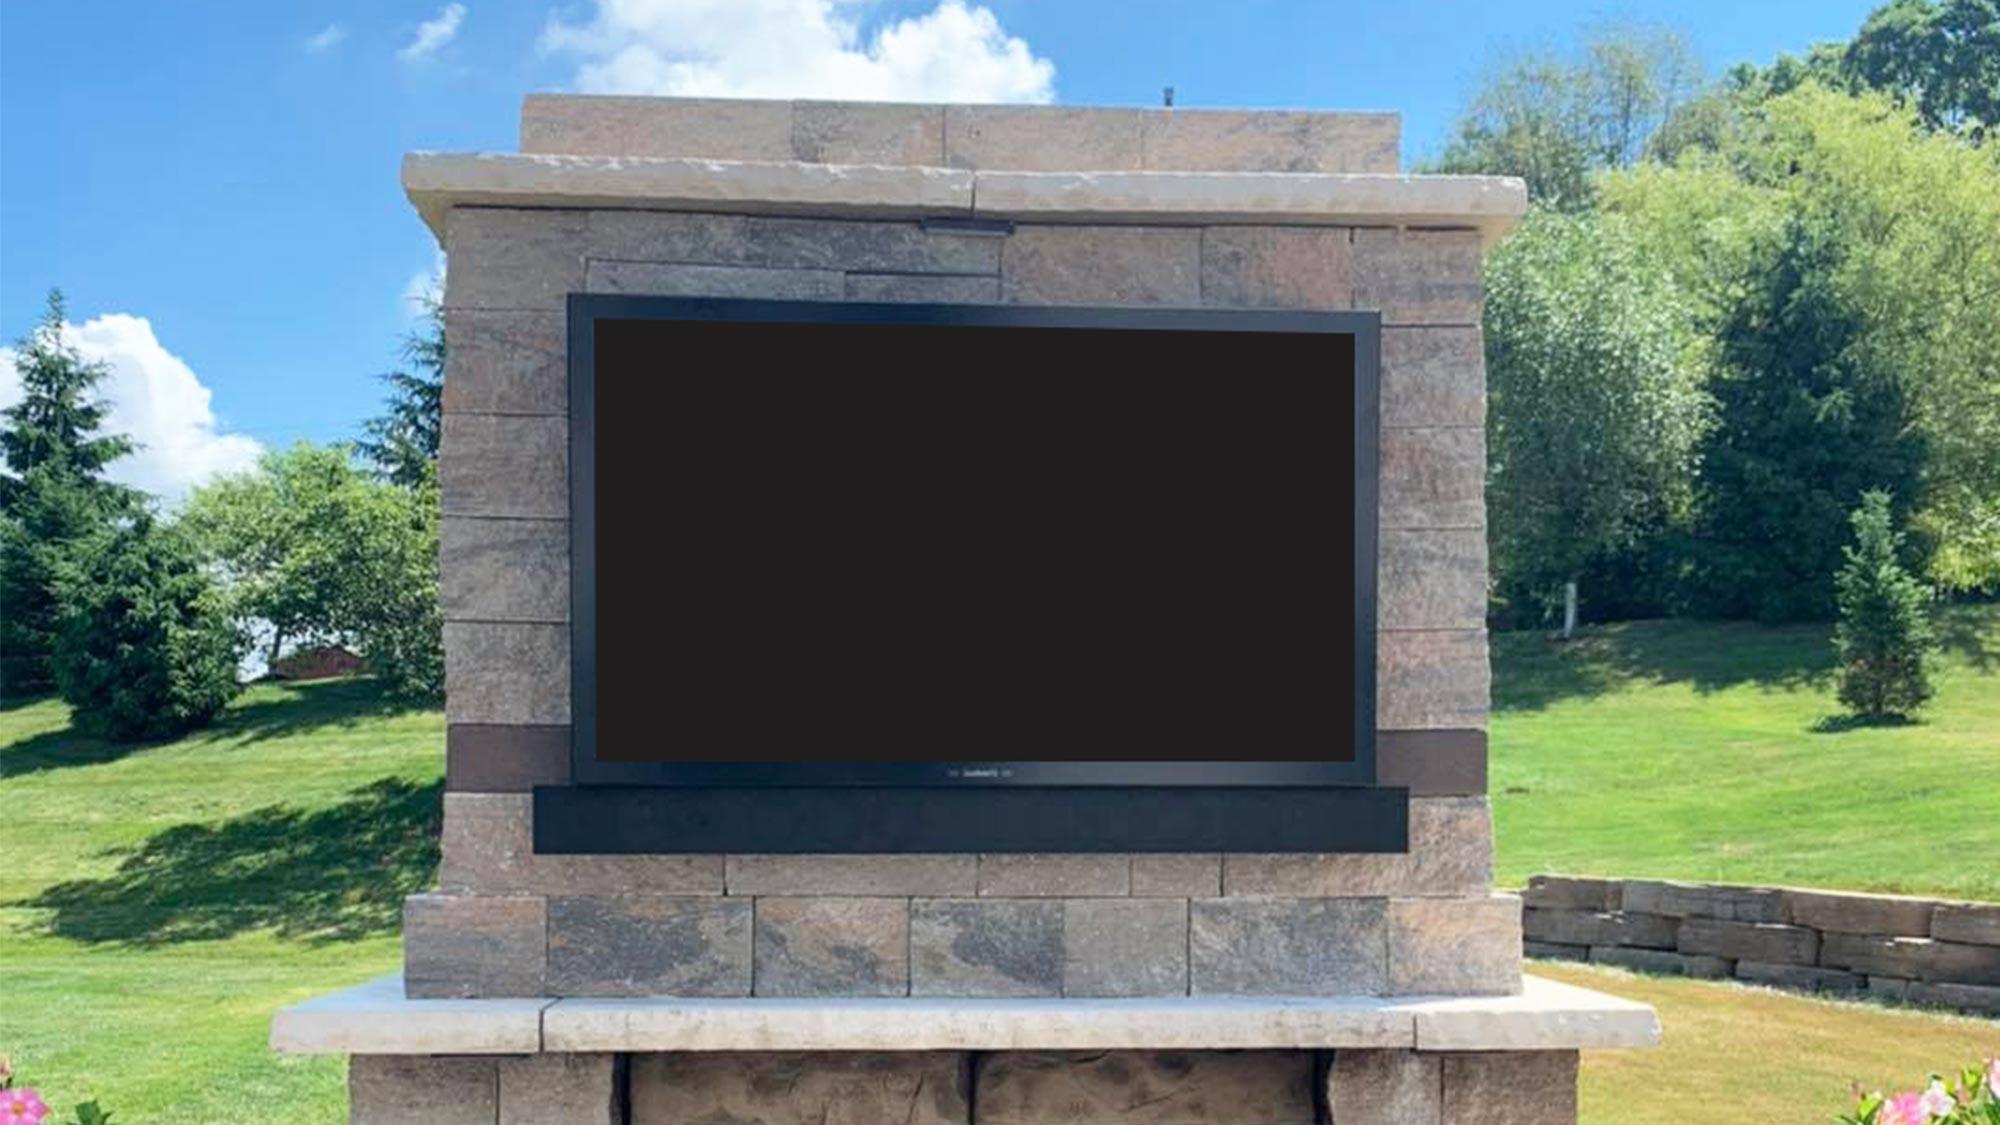 SunBriteTV Pro 2 Outdoor TV review